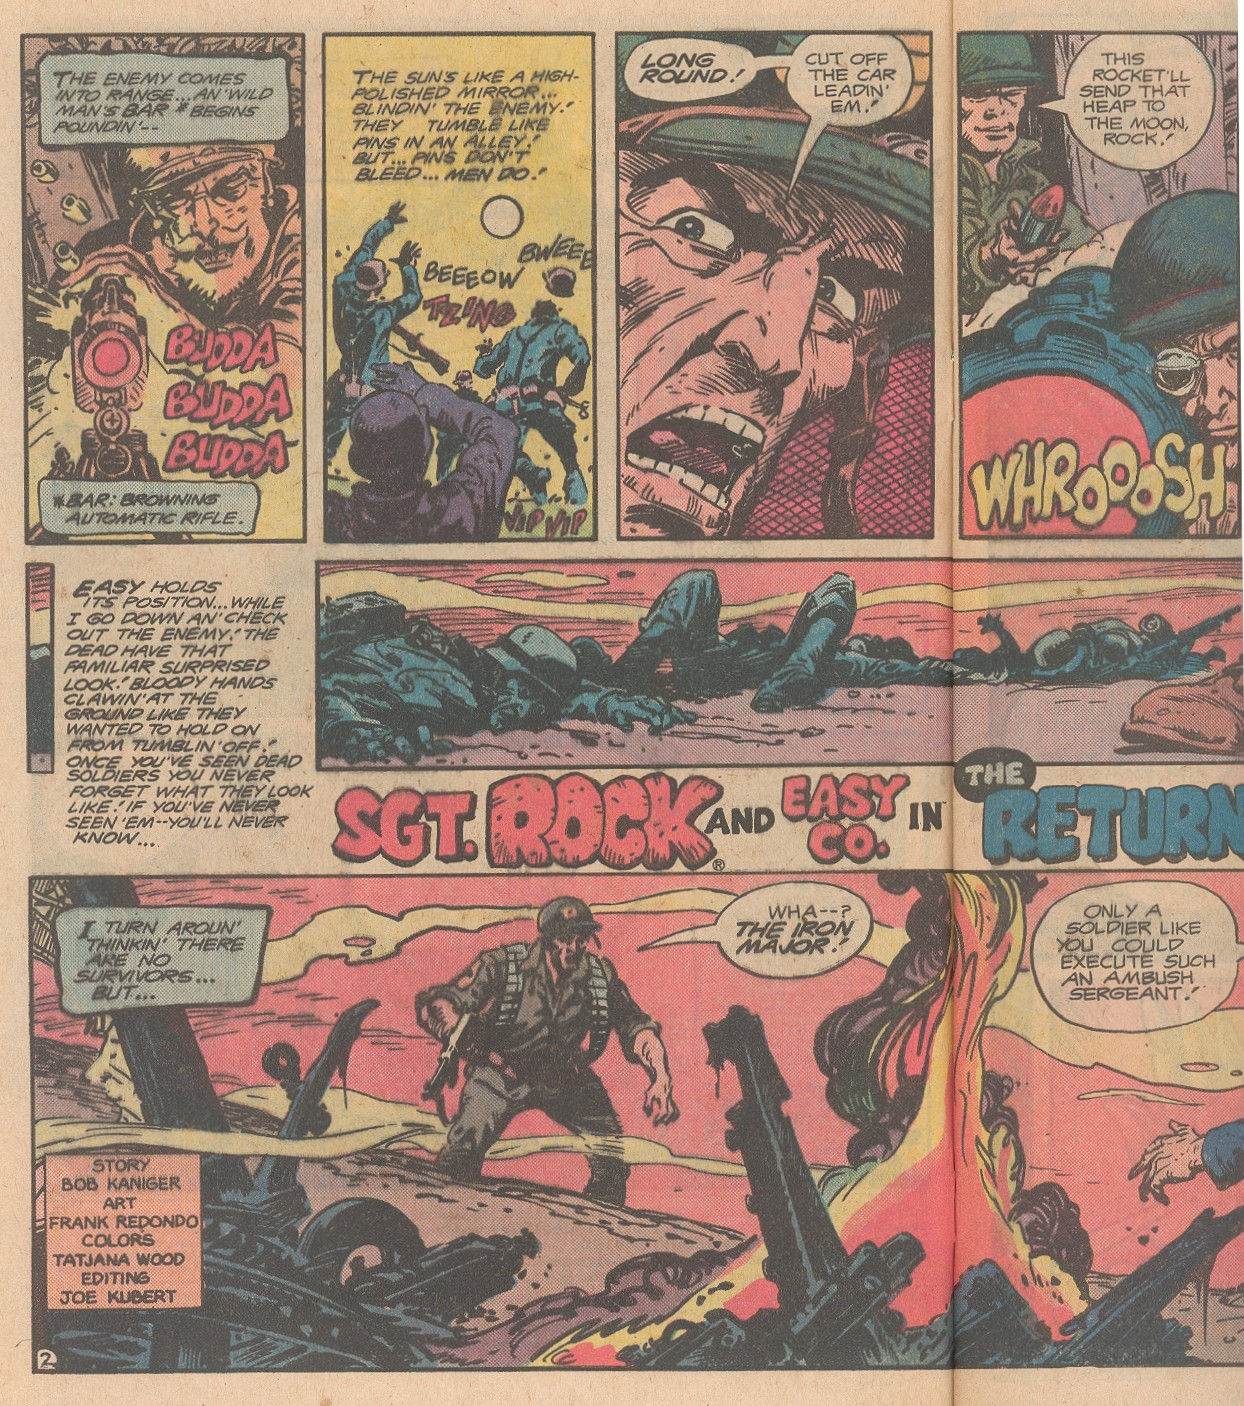 Read online Sgt. Rock comic -  Issue #345 - 3